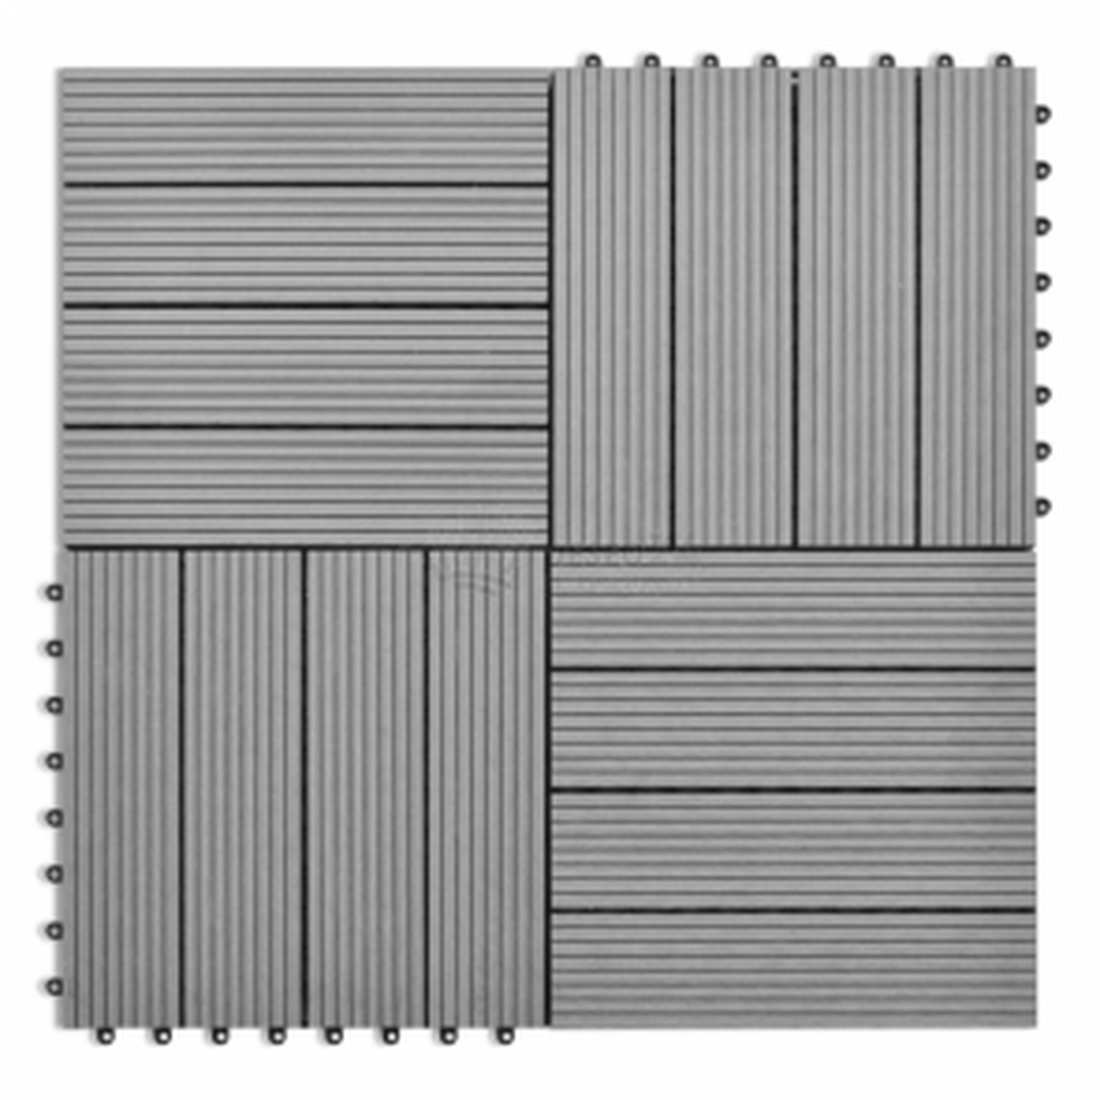 WPC dlaždice 30x30cm 11 ks 1 m2, šedé